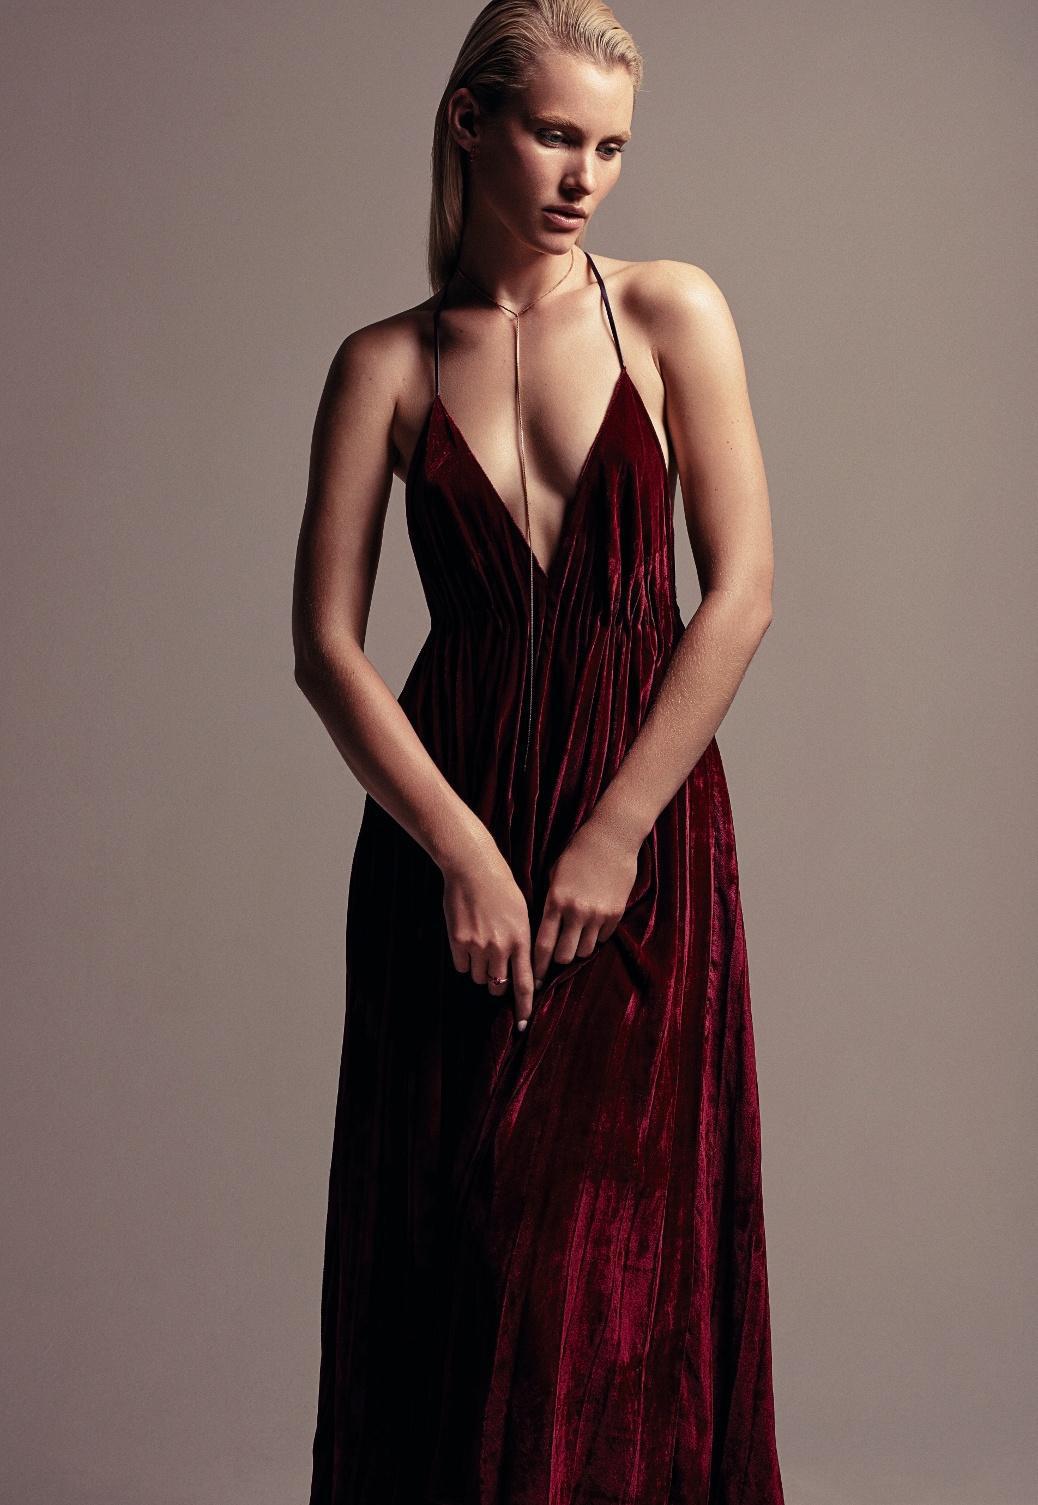 Bikini Emily Baker  nude (68 images), Facebook, lingerie